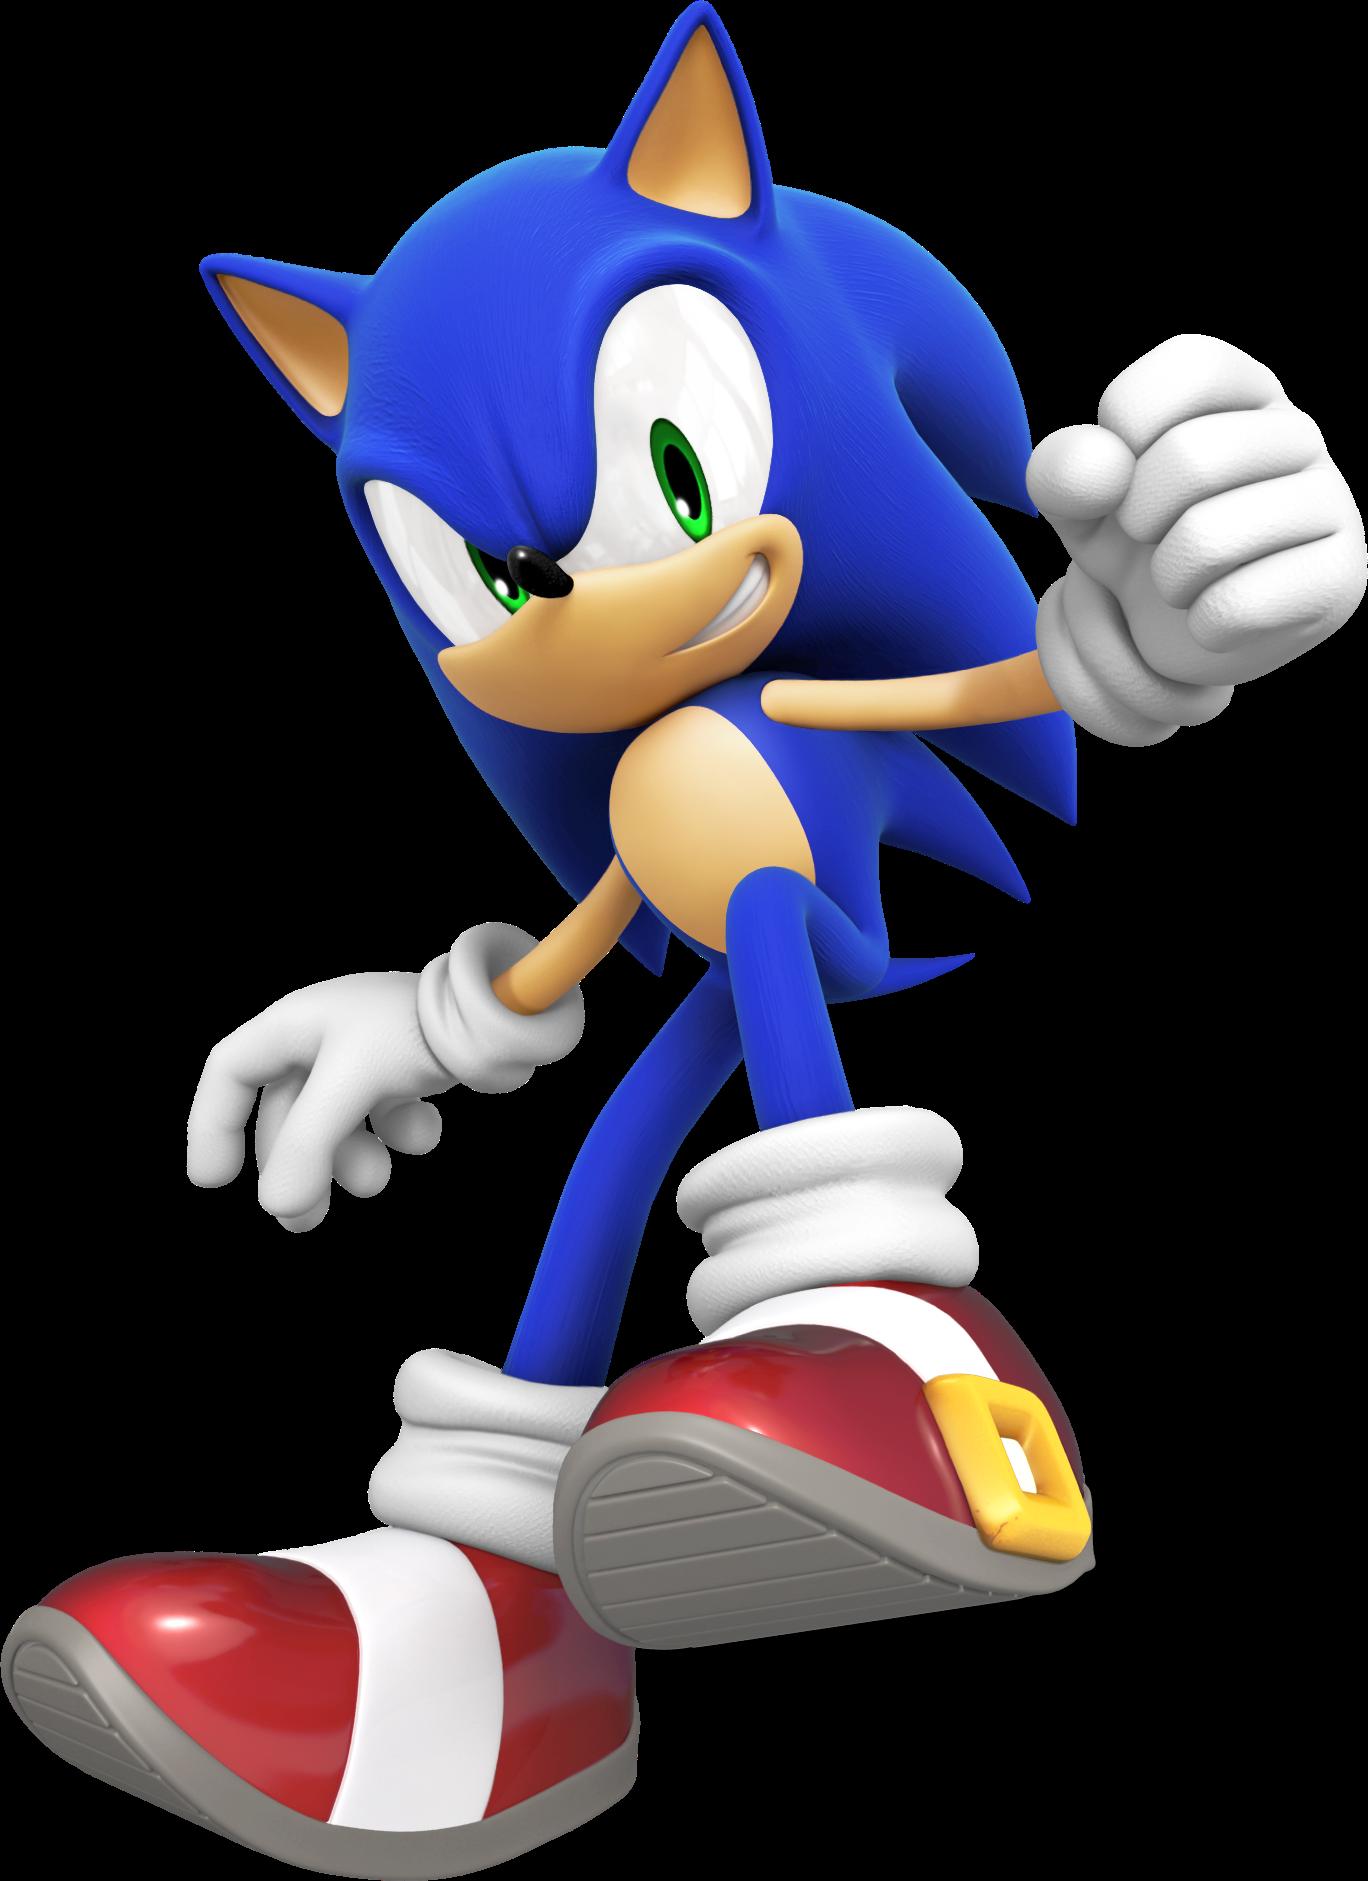 Sonic the hedgehog mario wiki